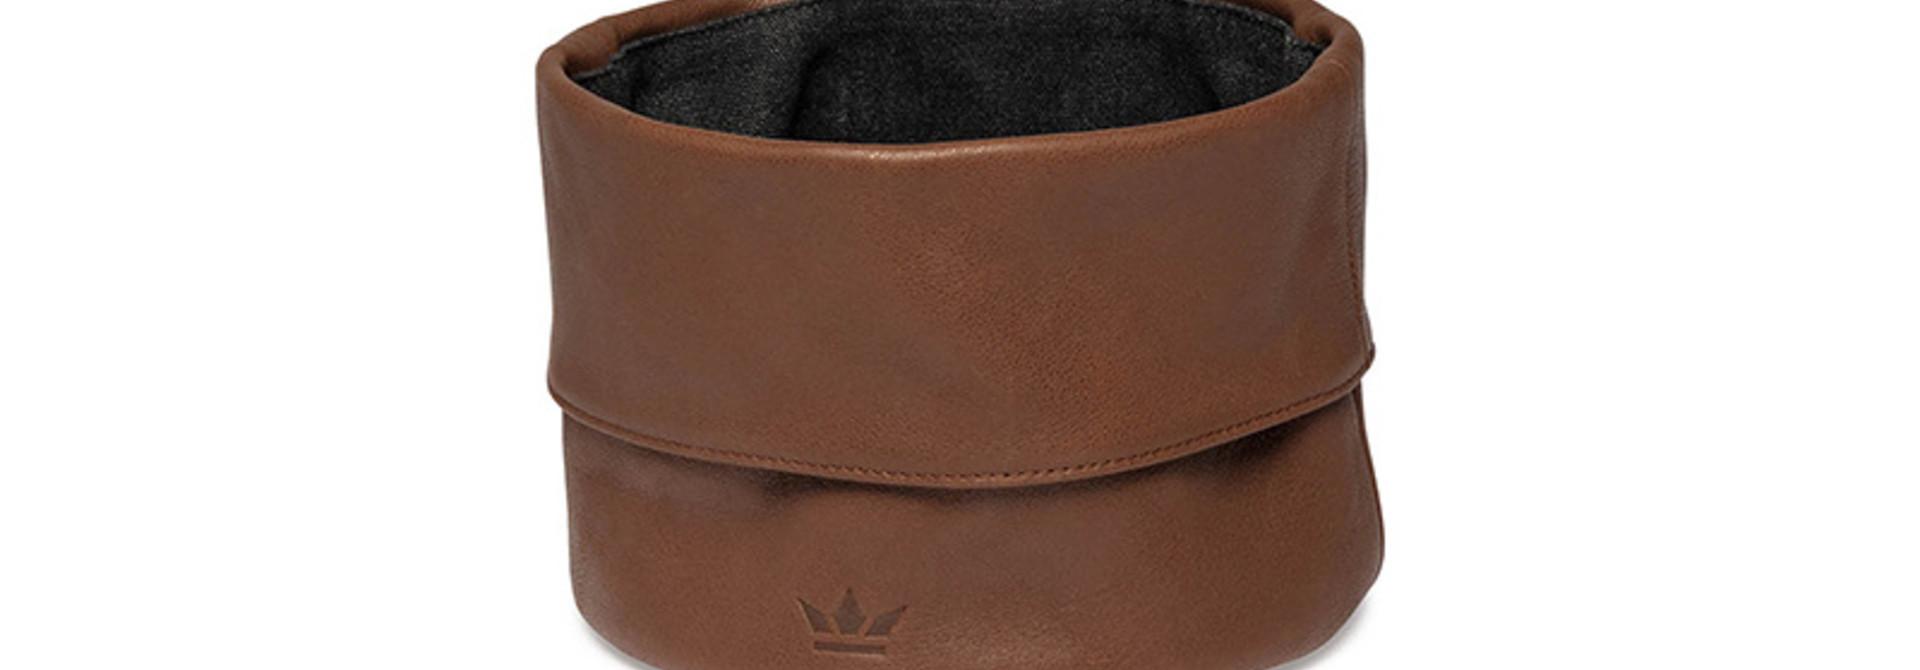 Bread Basket - Ben - Leather - Cognac